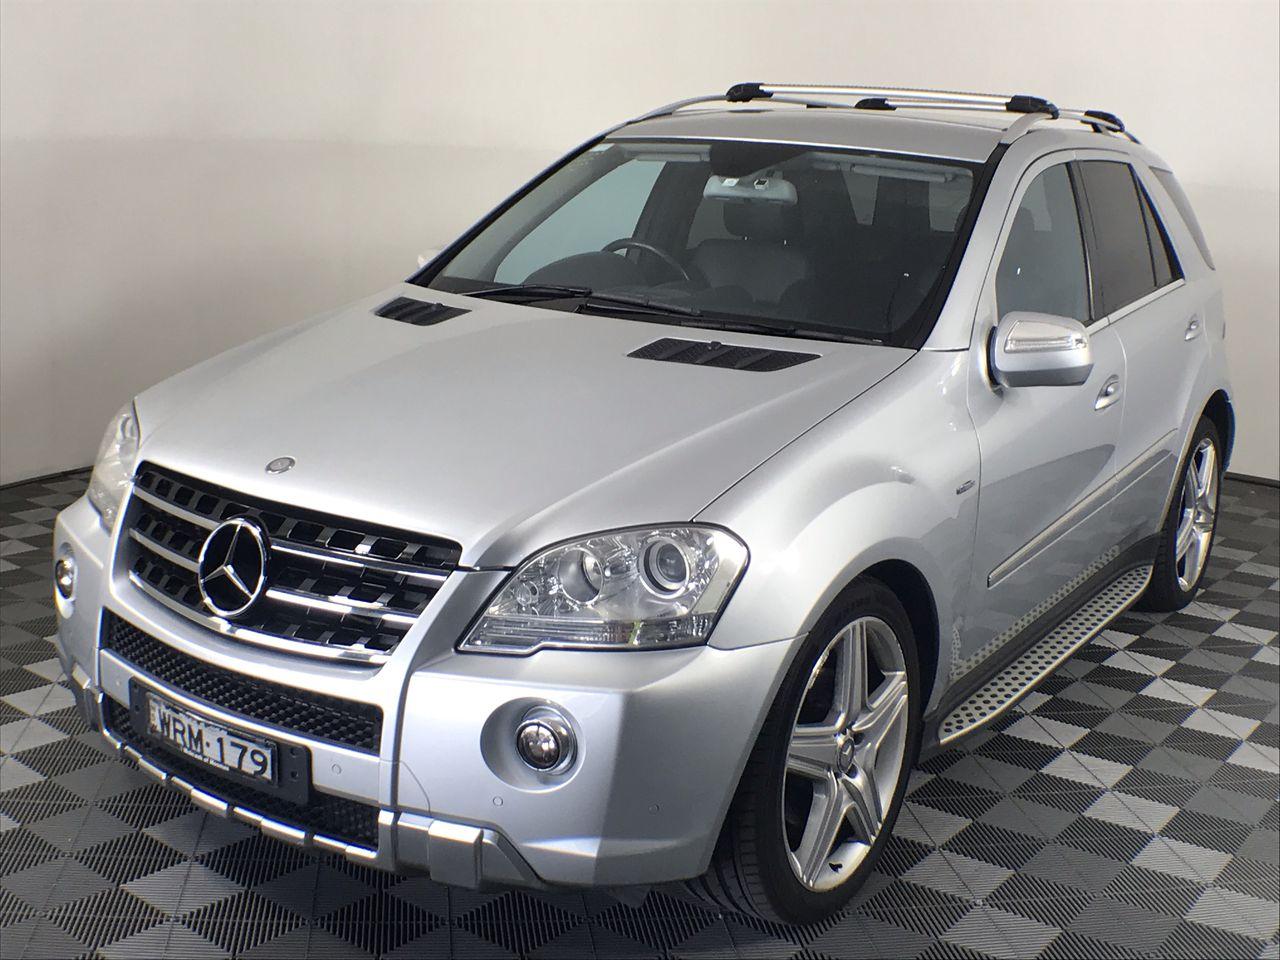 2009 Mercedes Benz ML 300 CDI (4x4) W164 Turbo Diesel Automatic Wagon